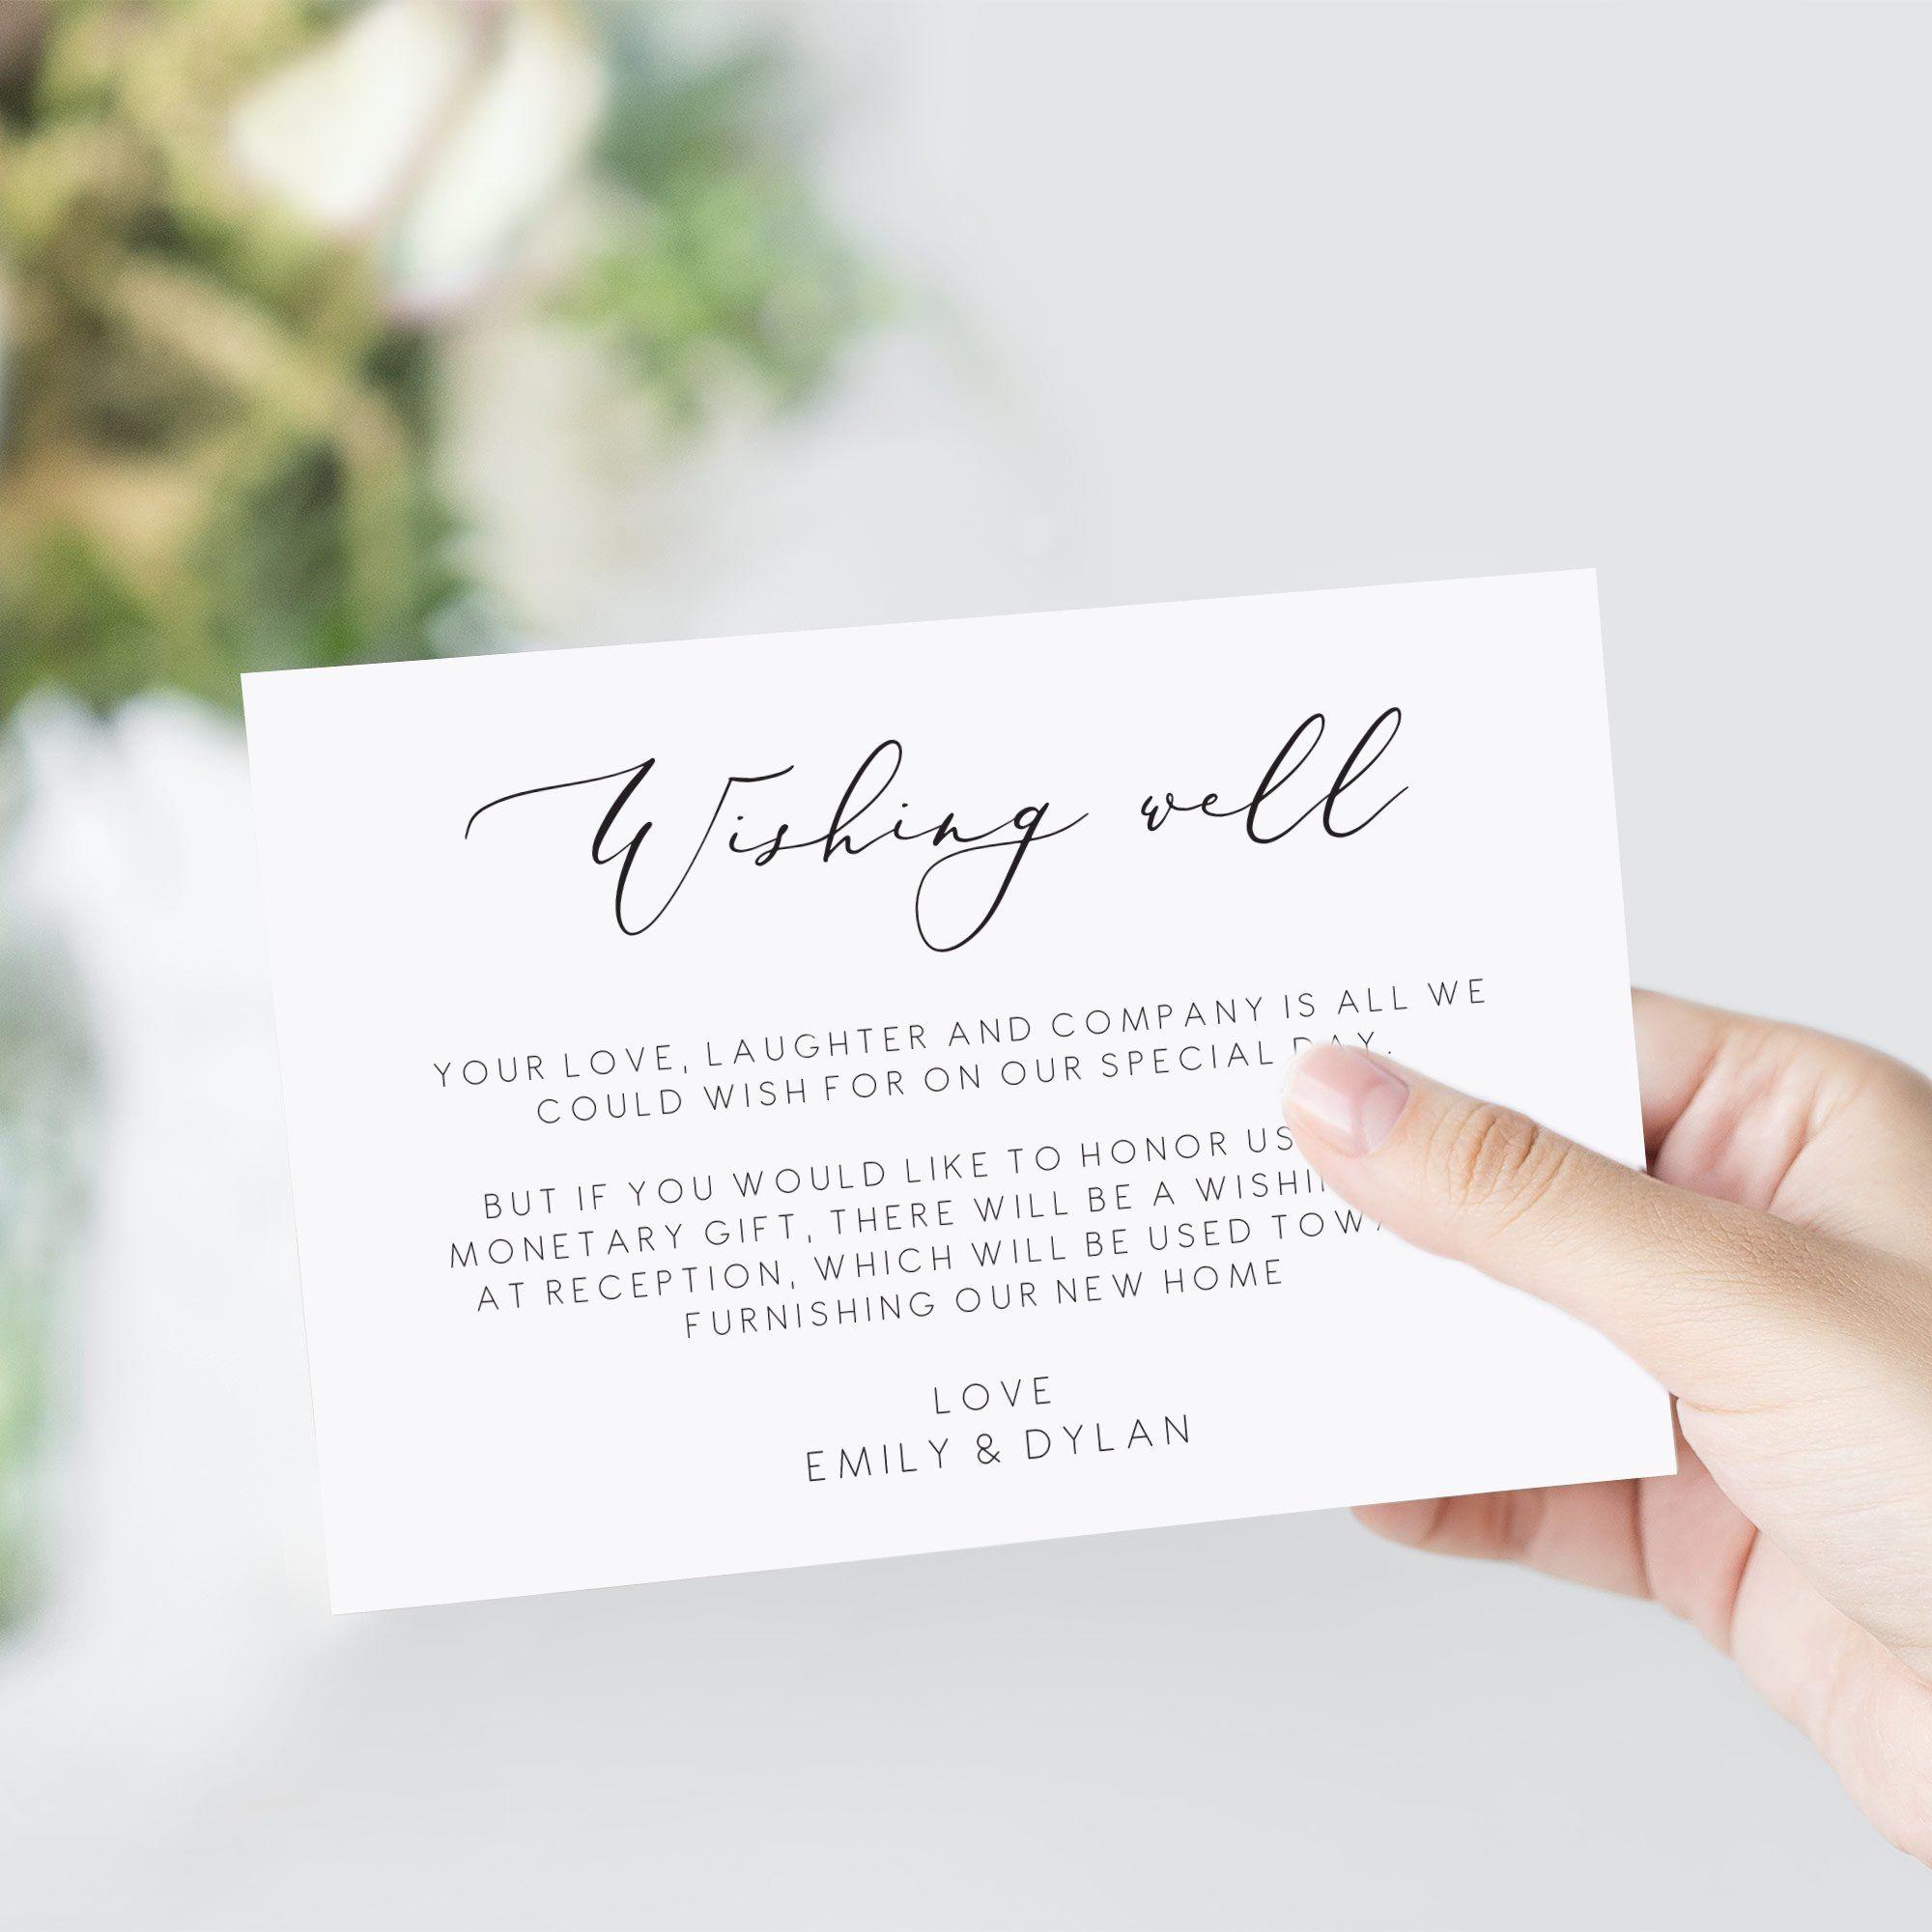 Online Gifts For Wedding: Elegant Wishing Well Card Wedding Gift Card, Wedding